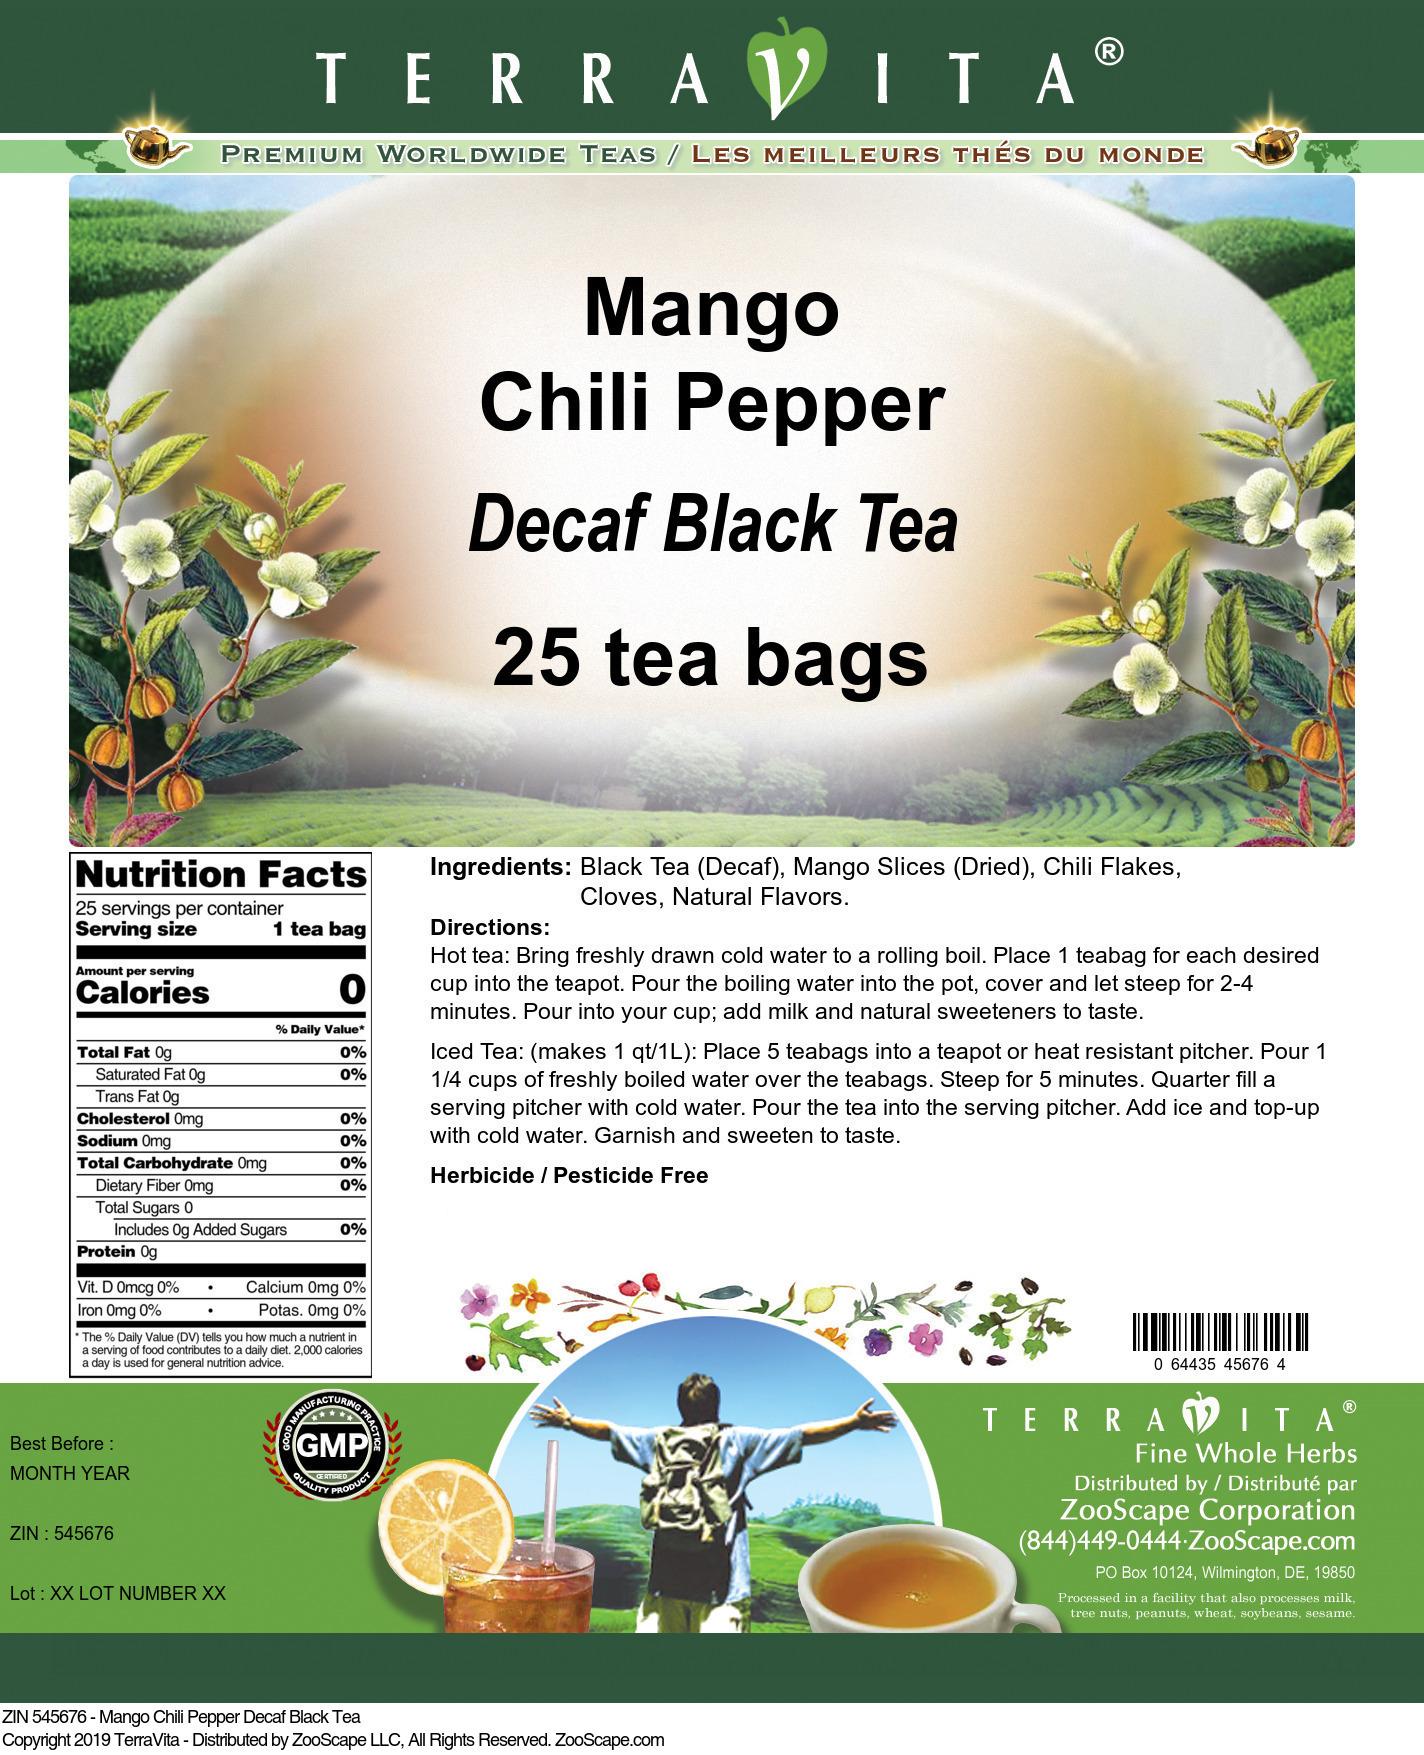 Mango Chili Pepper Decaf Black Tea